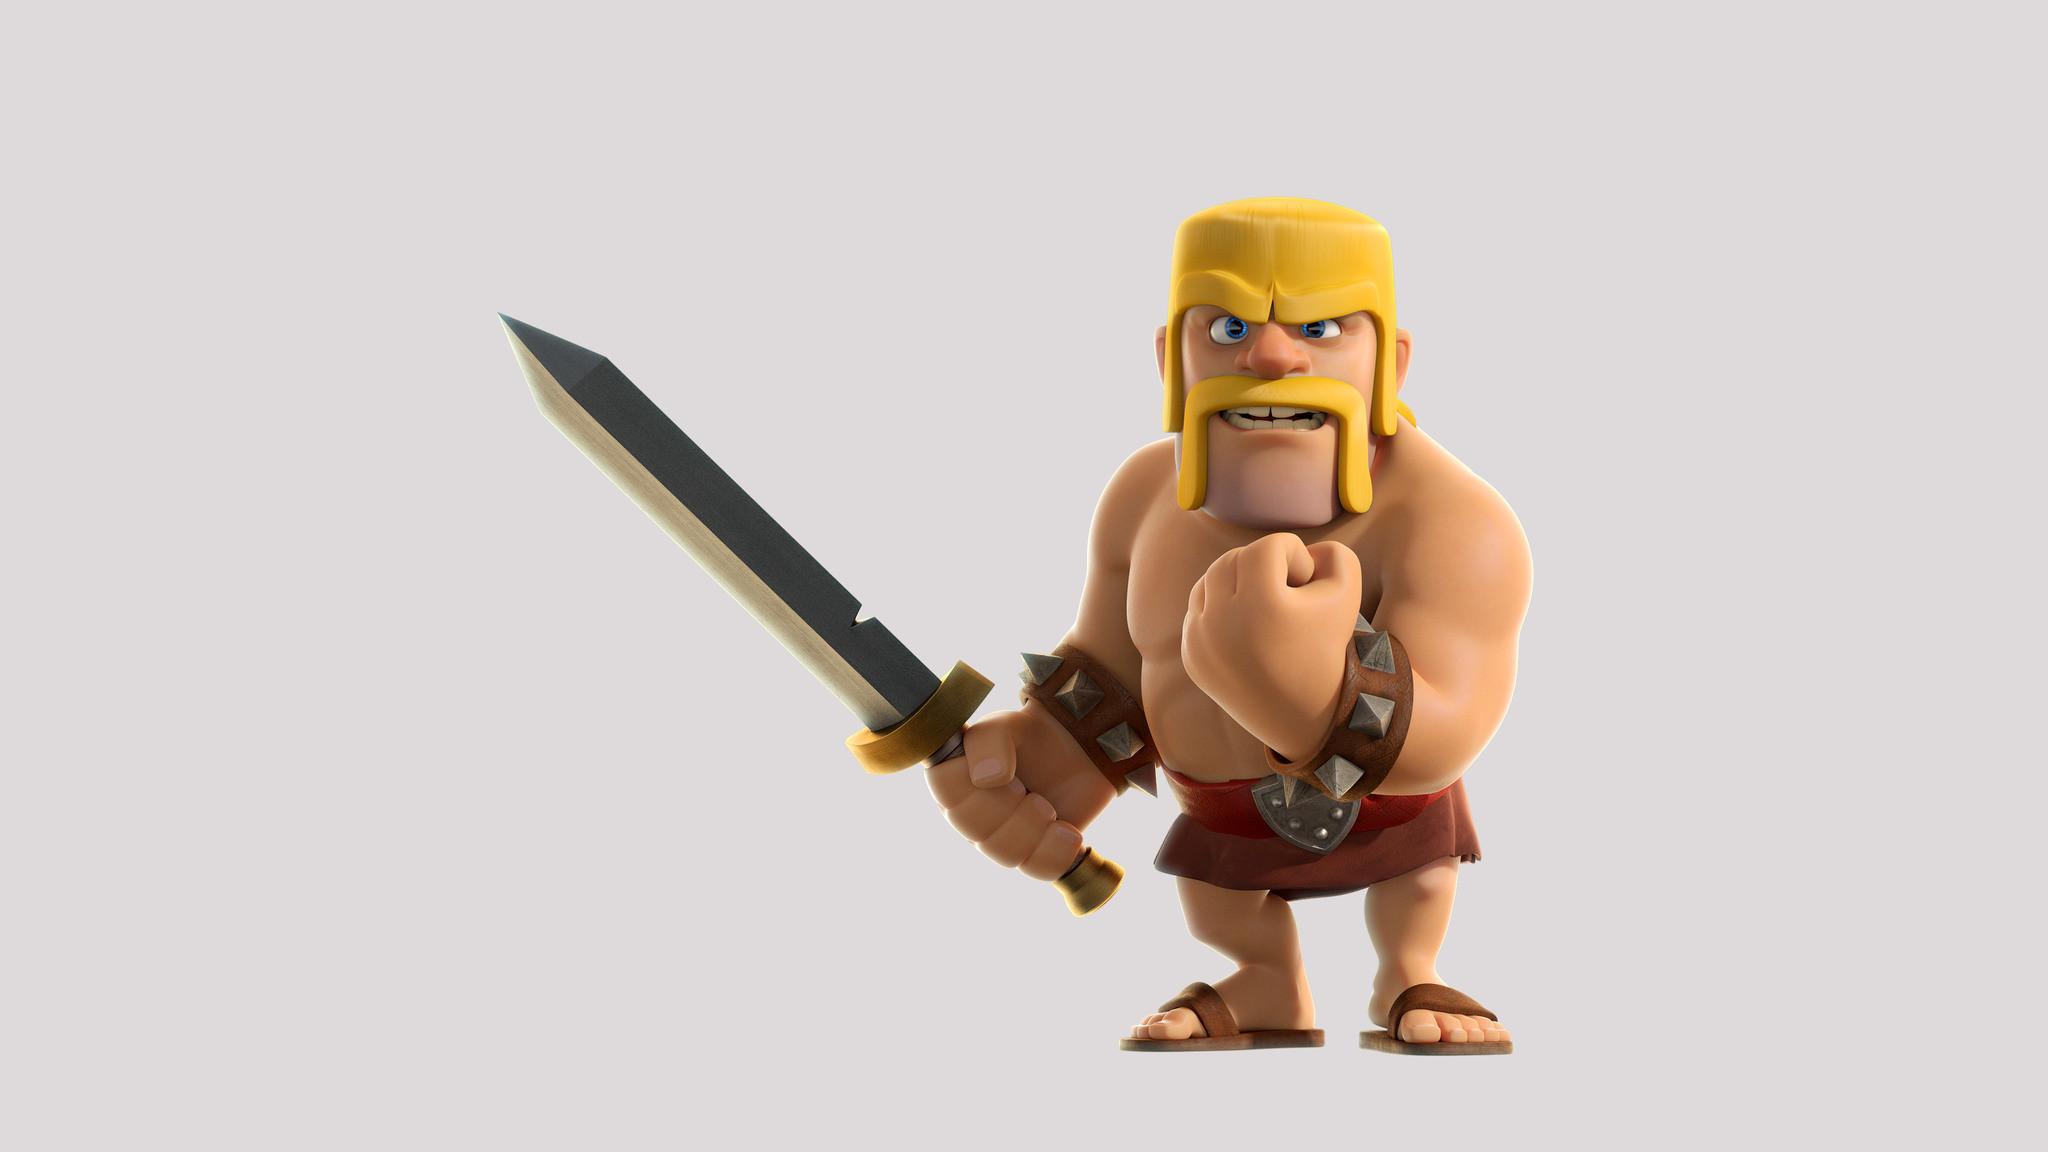 barbarian-clash-of-clans-4k-kx.jpg